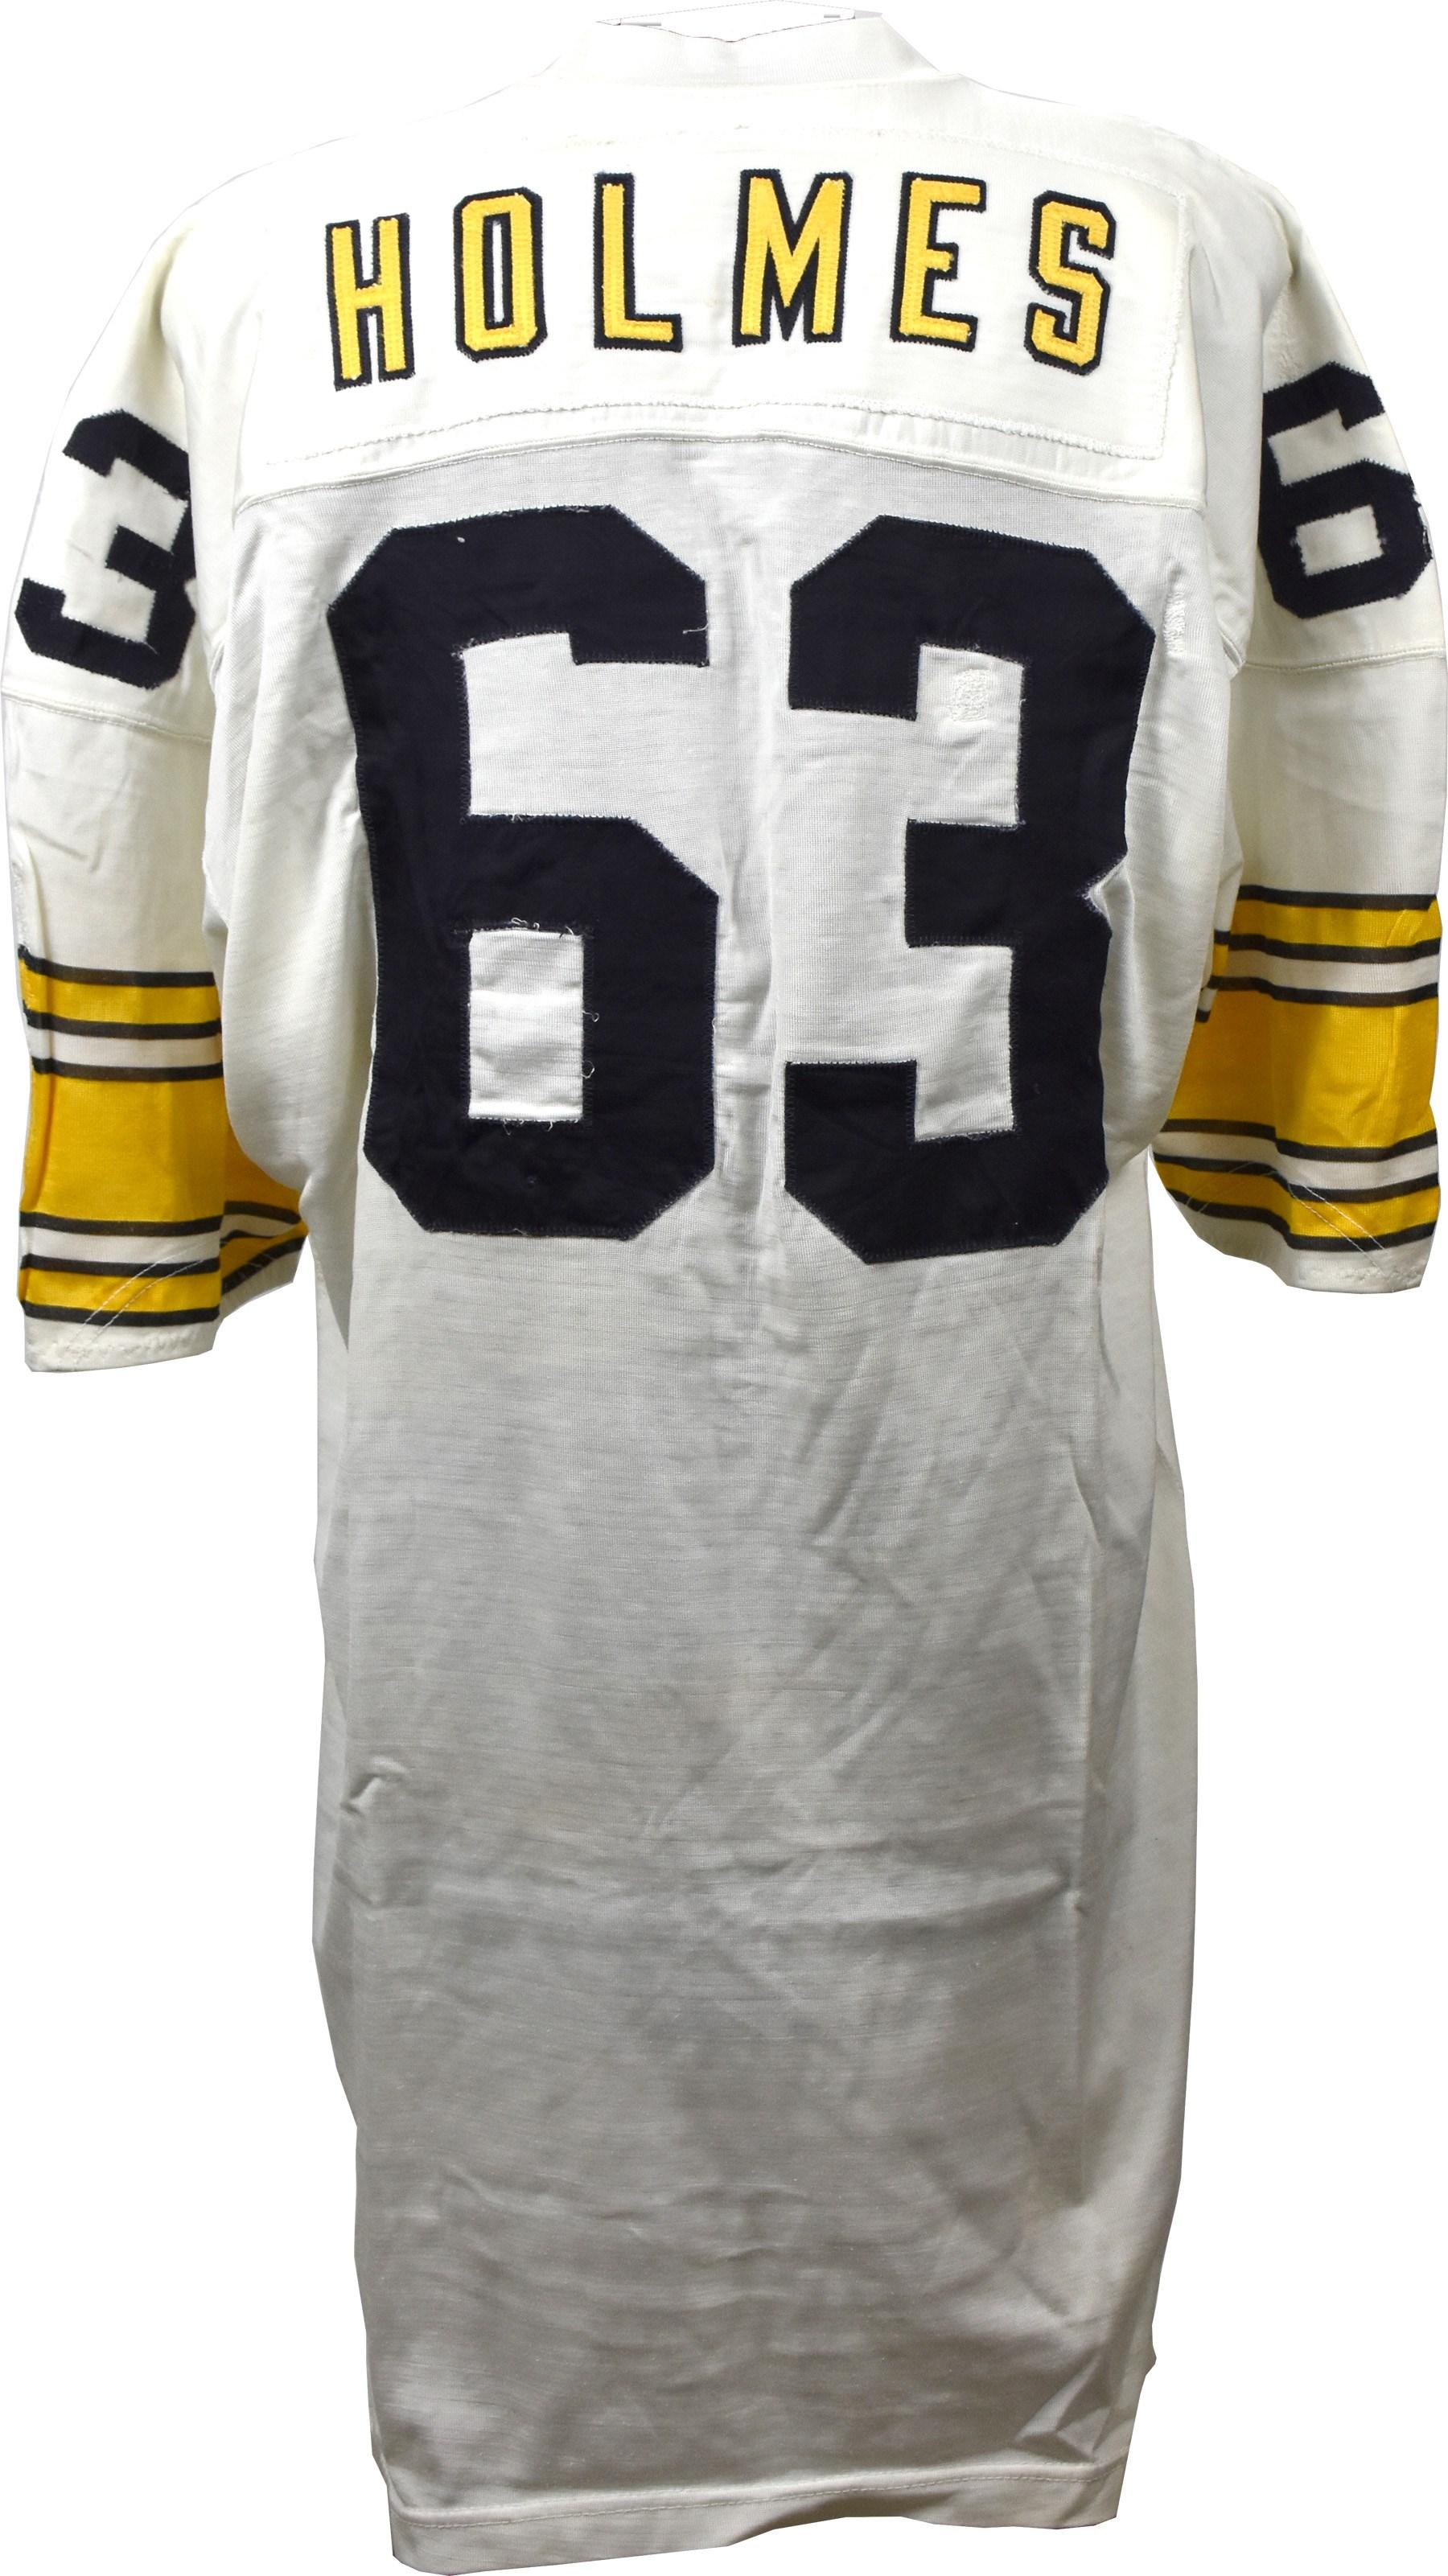 e2794c750c1 1975 Ernie Holmes Game Worn Pittsburgh Steelers Jersey